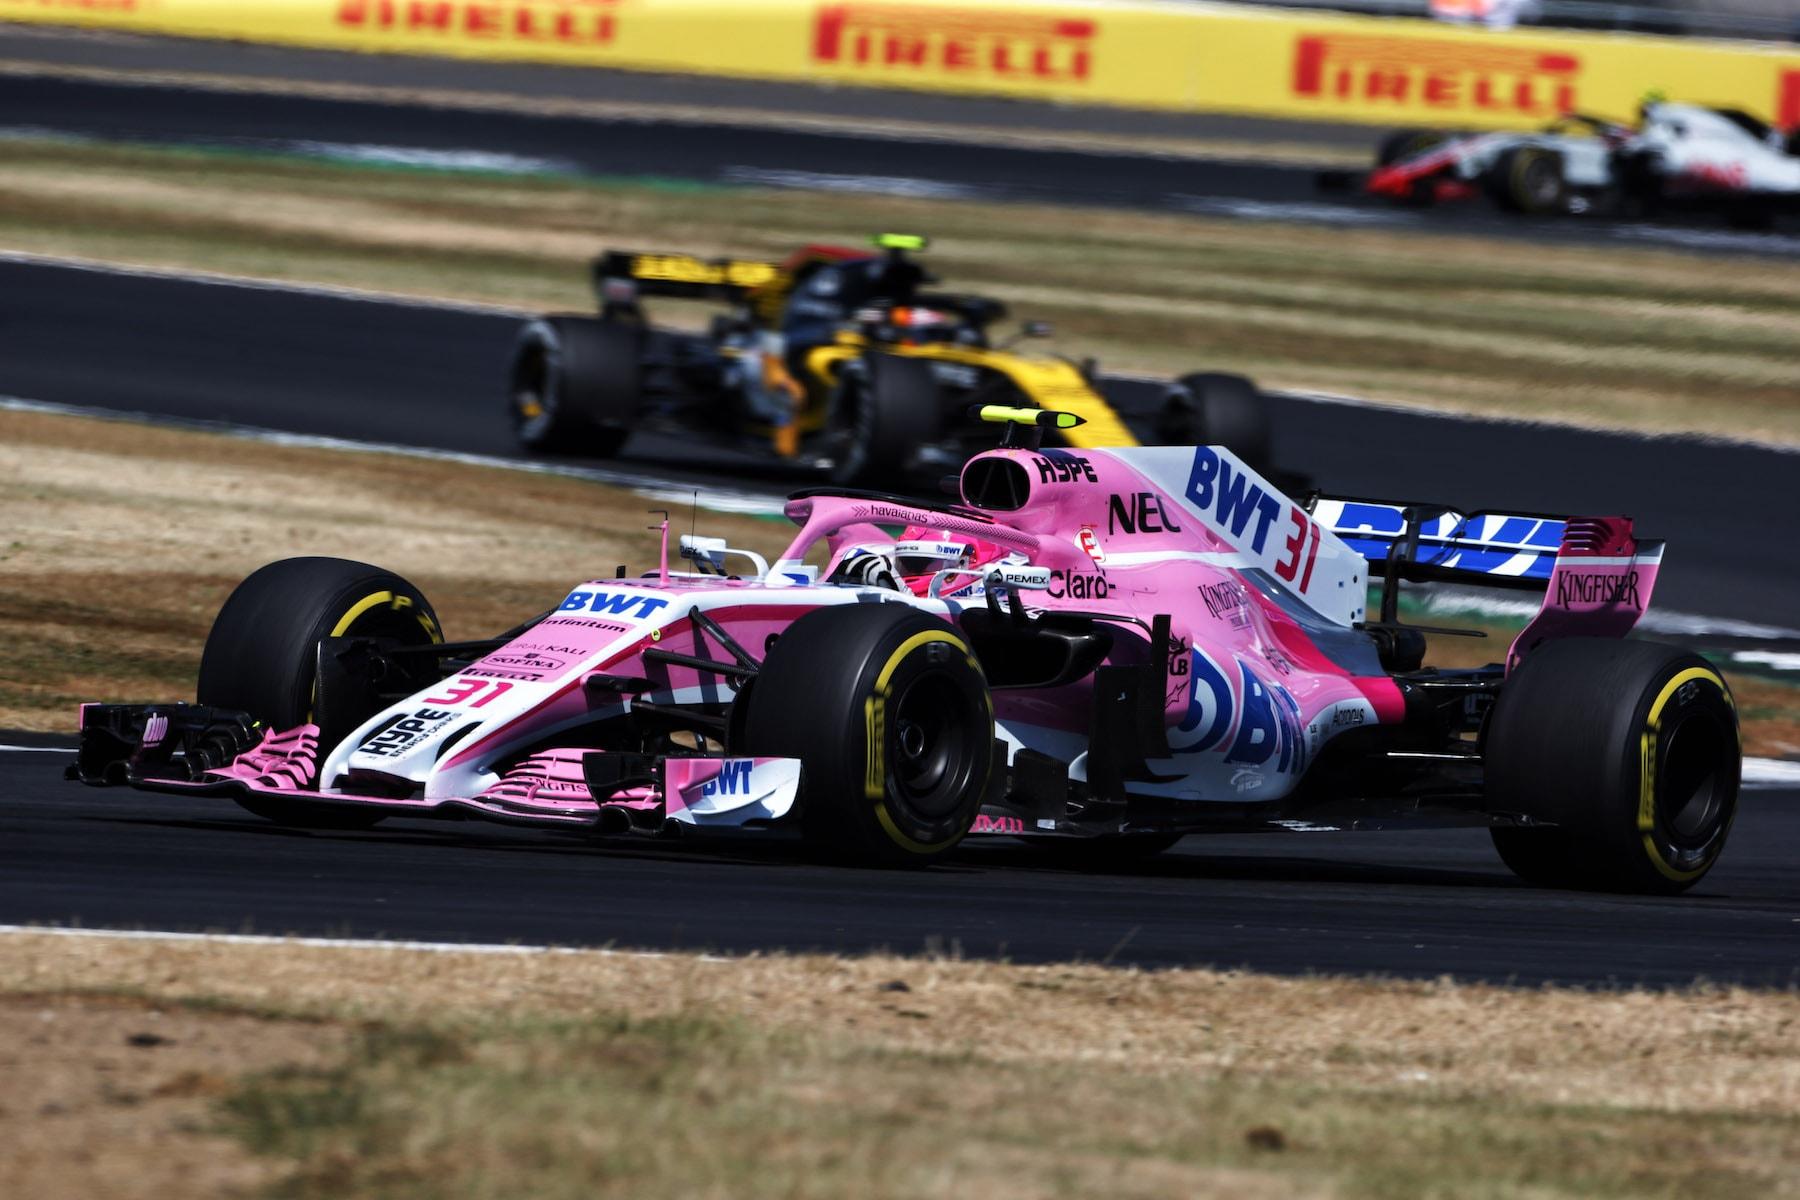 G 2018 Esteban Ocon | Force India VJM10 | 2018 British GP 1 copy.jpg